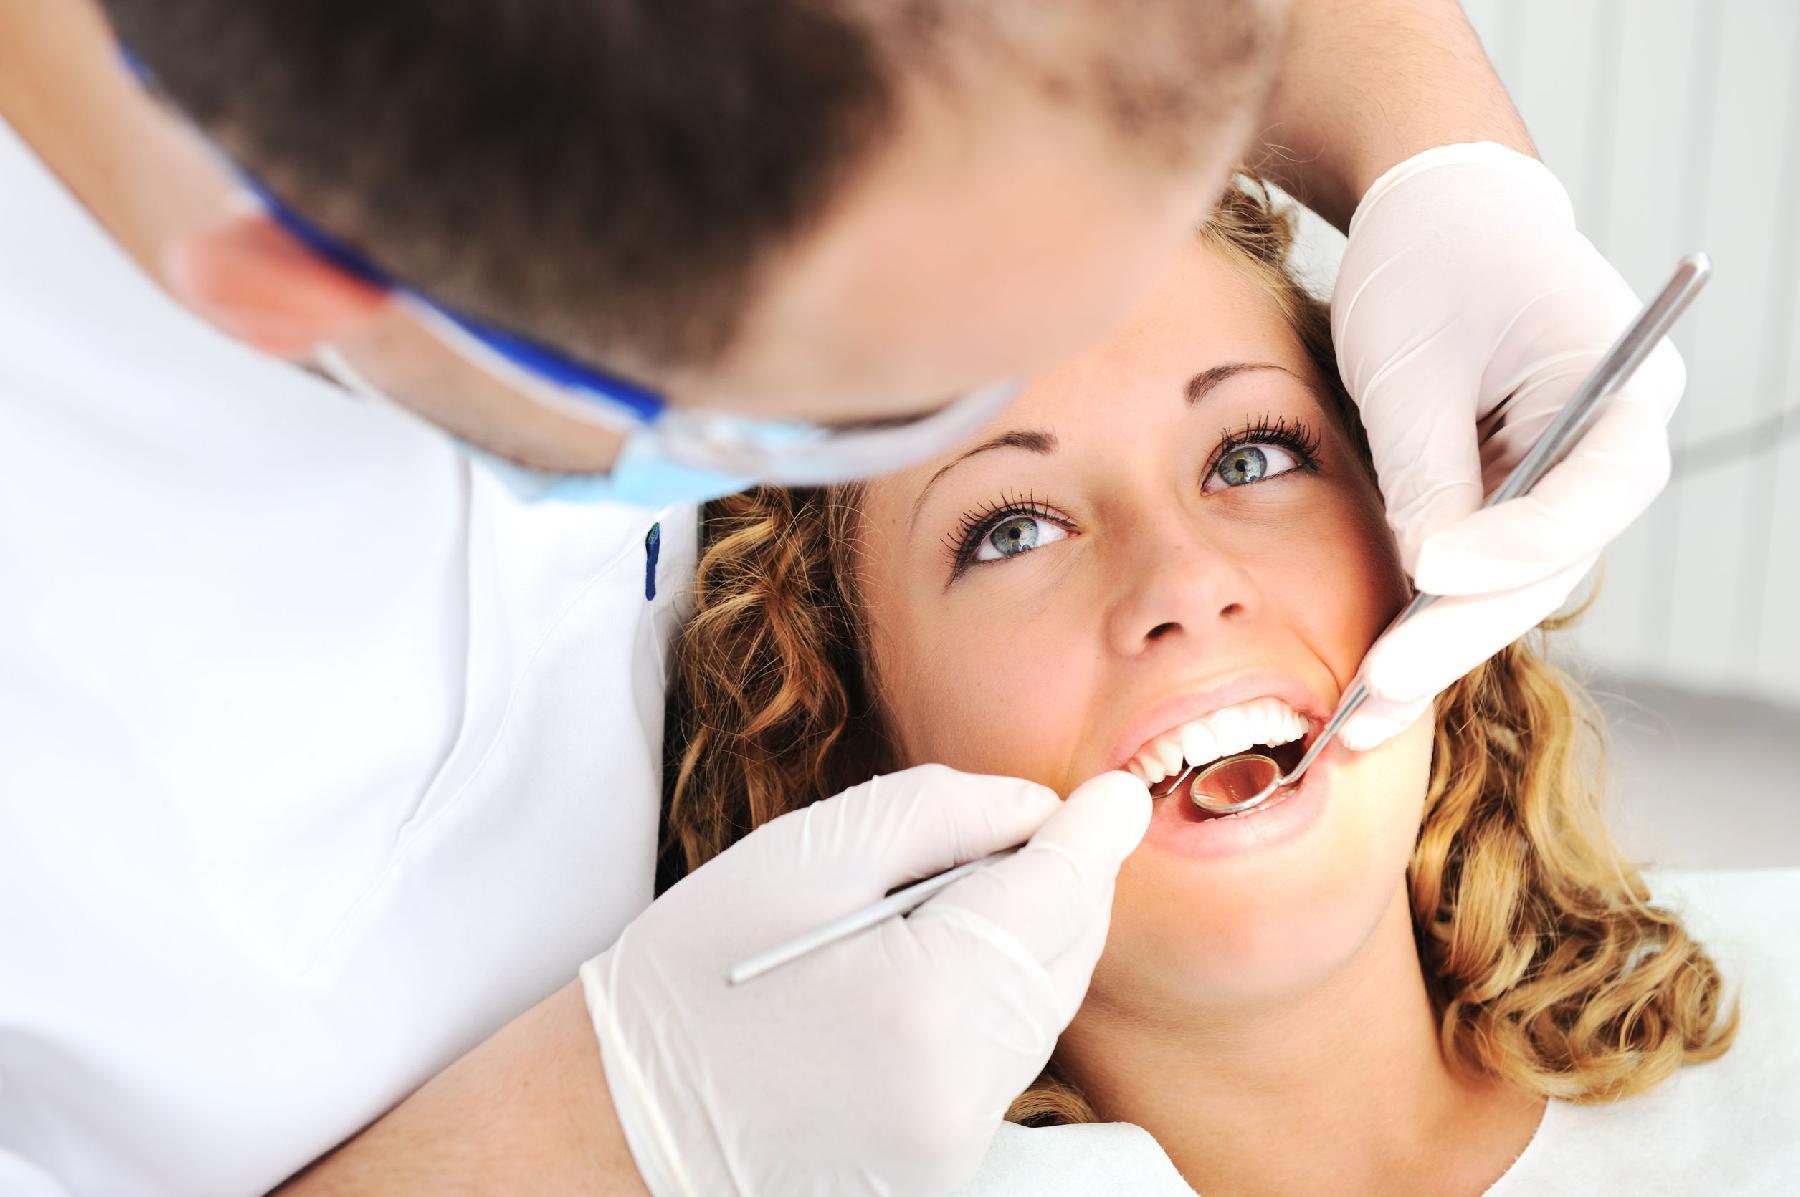 Dental care and coronavirus (COVID-19)